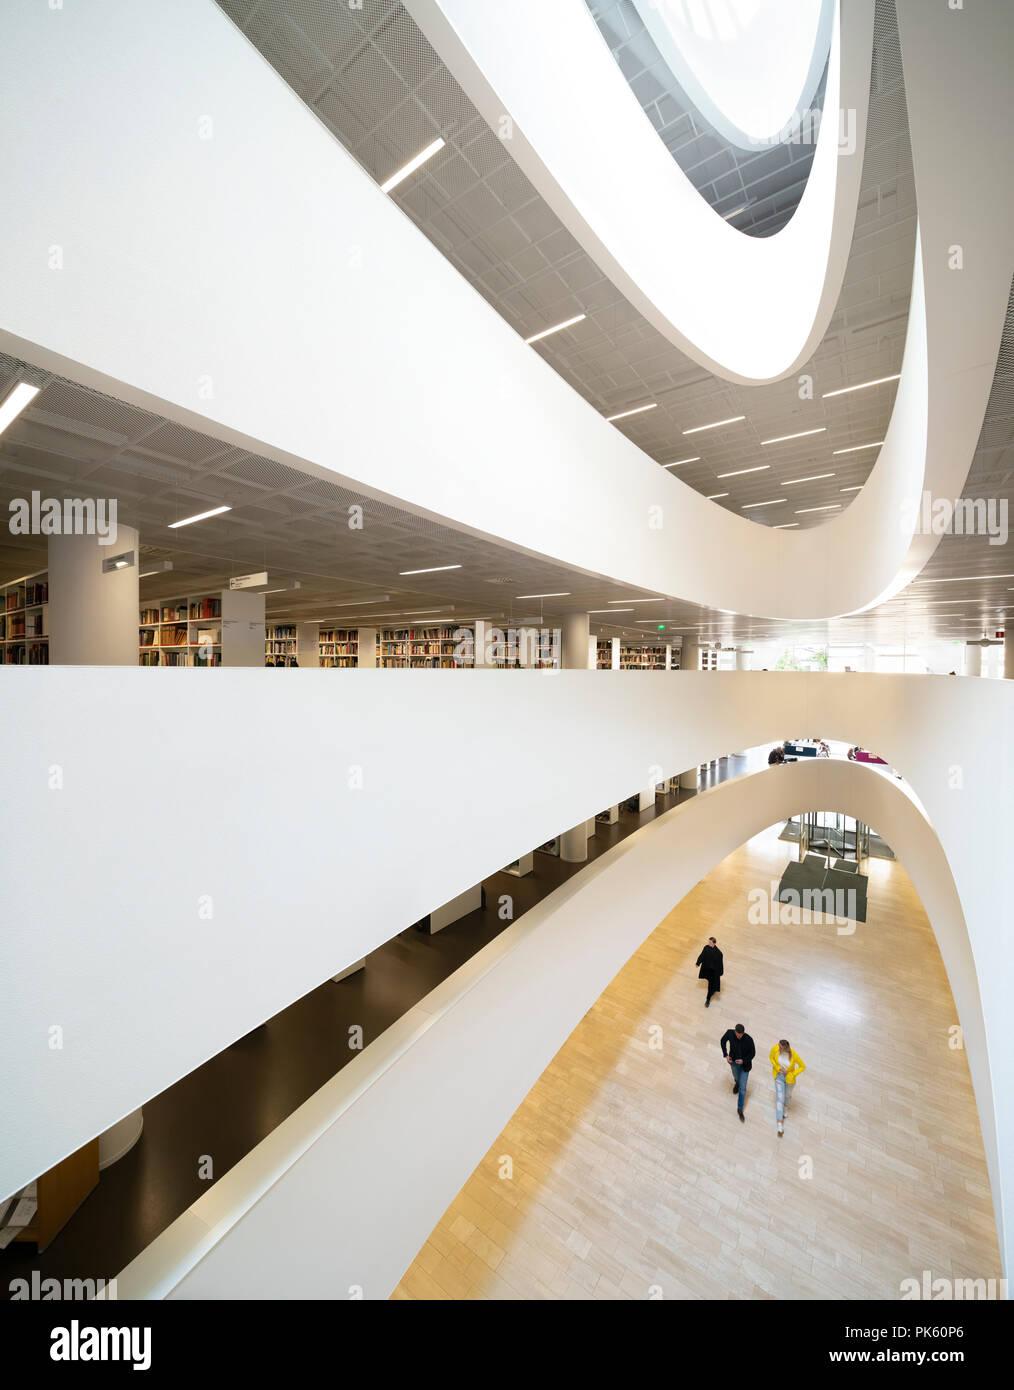 Kaisa House, Università di Helsinki Libreria Principale, Helsingin yliopiston pääkirjasto, Helsinki Finlandia Foto Stock